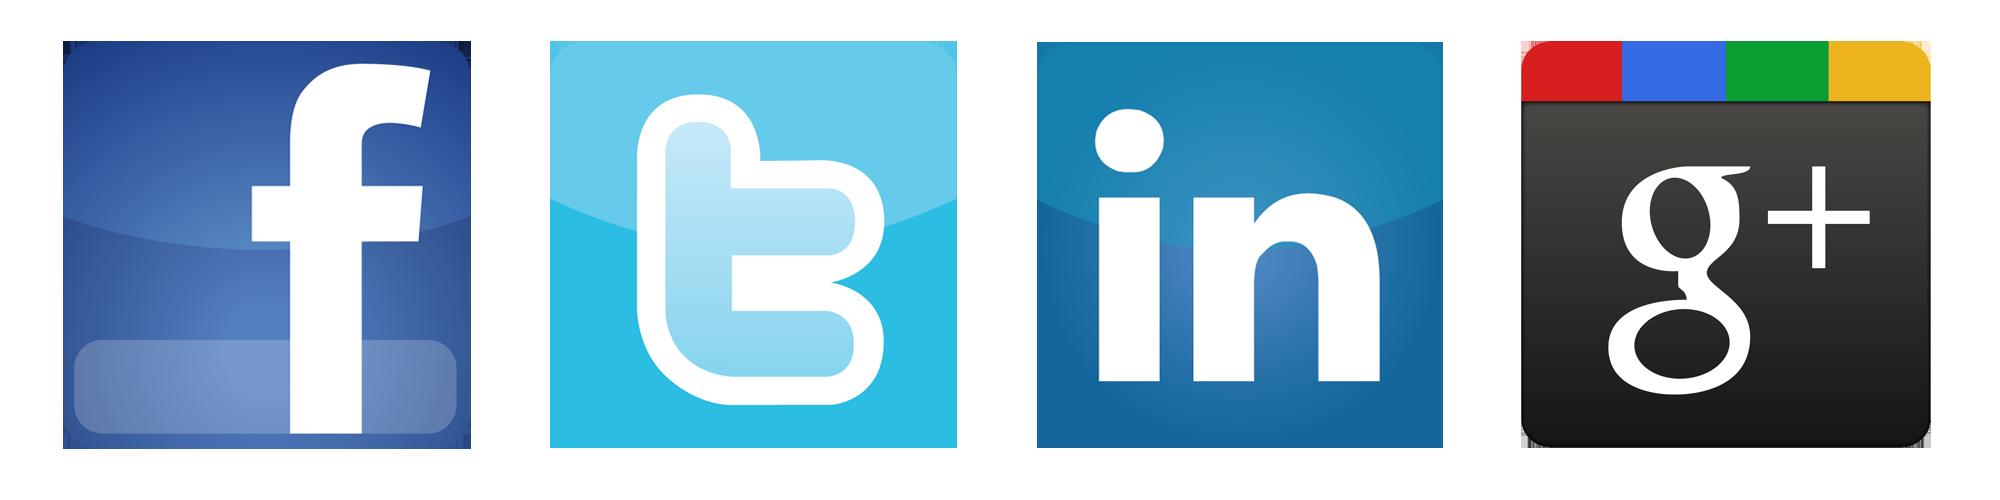 2000x500 Social Media Marketing Blog Button